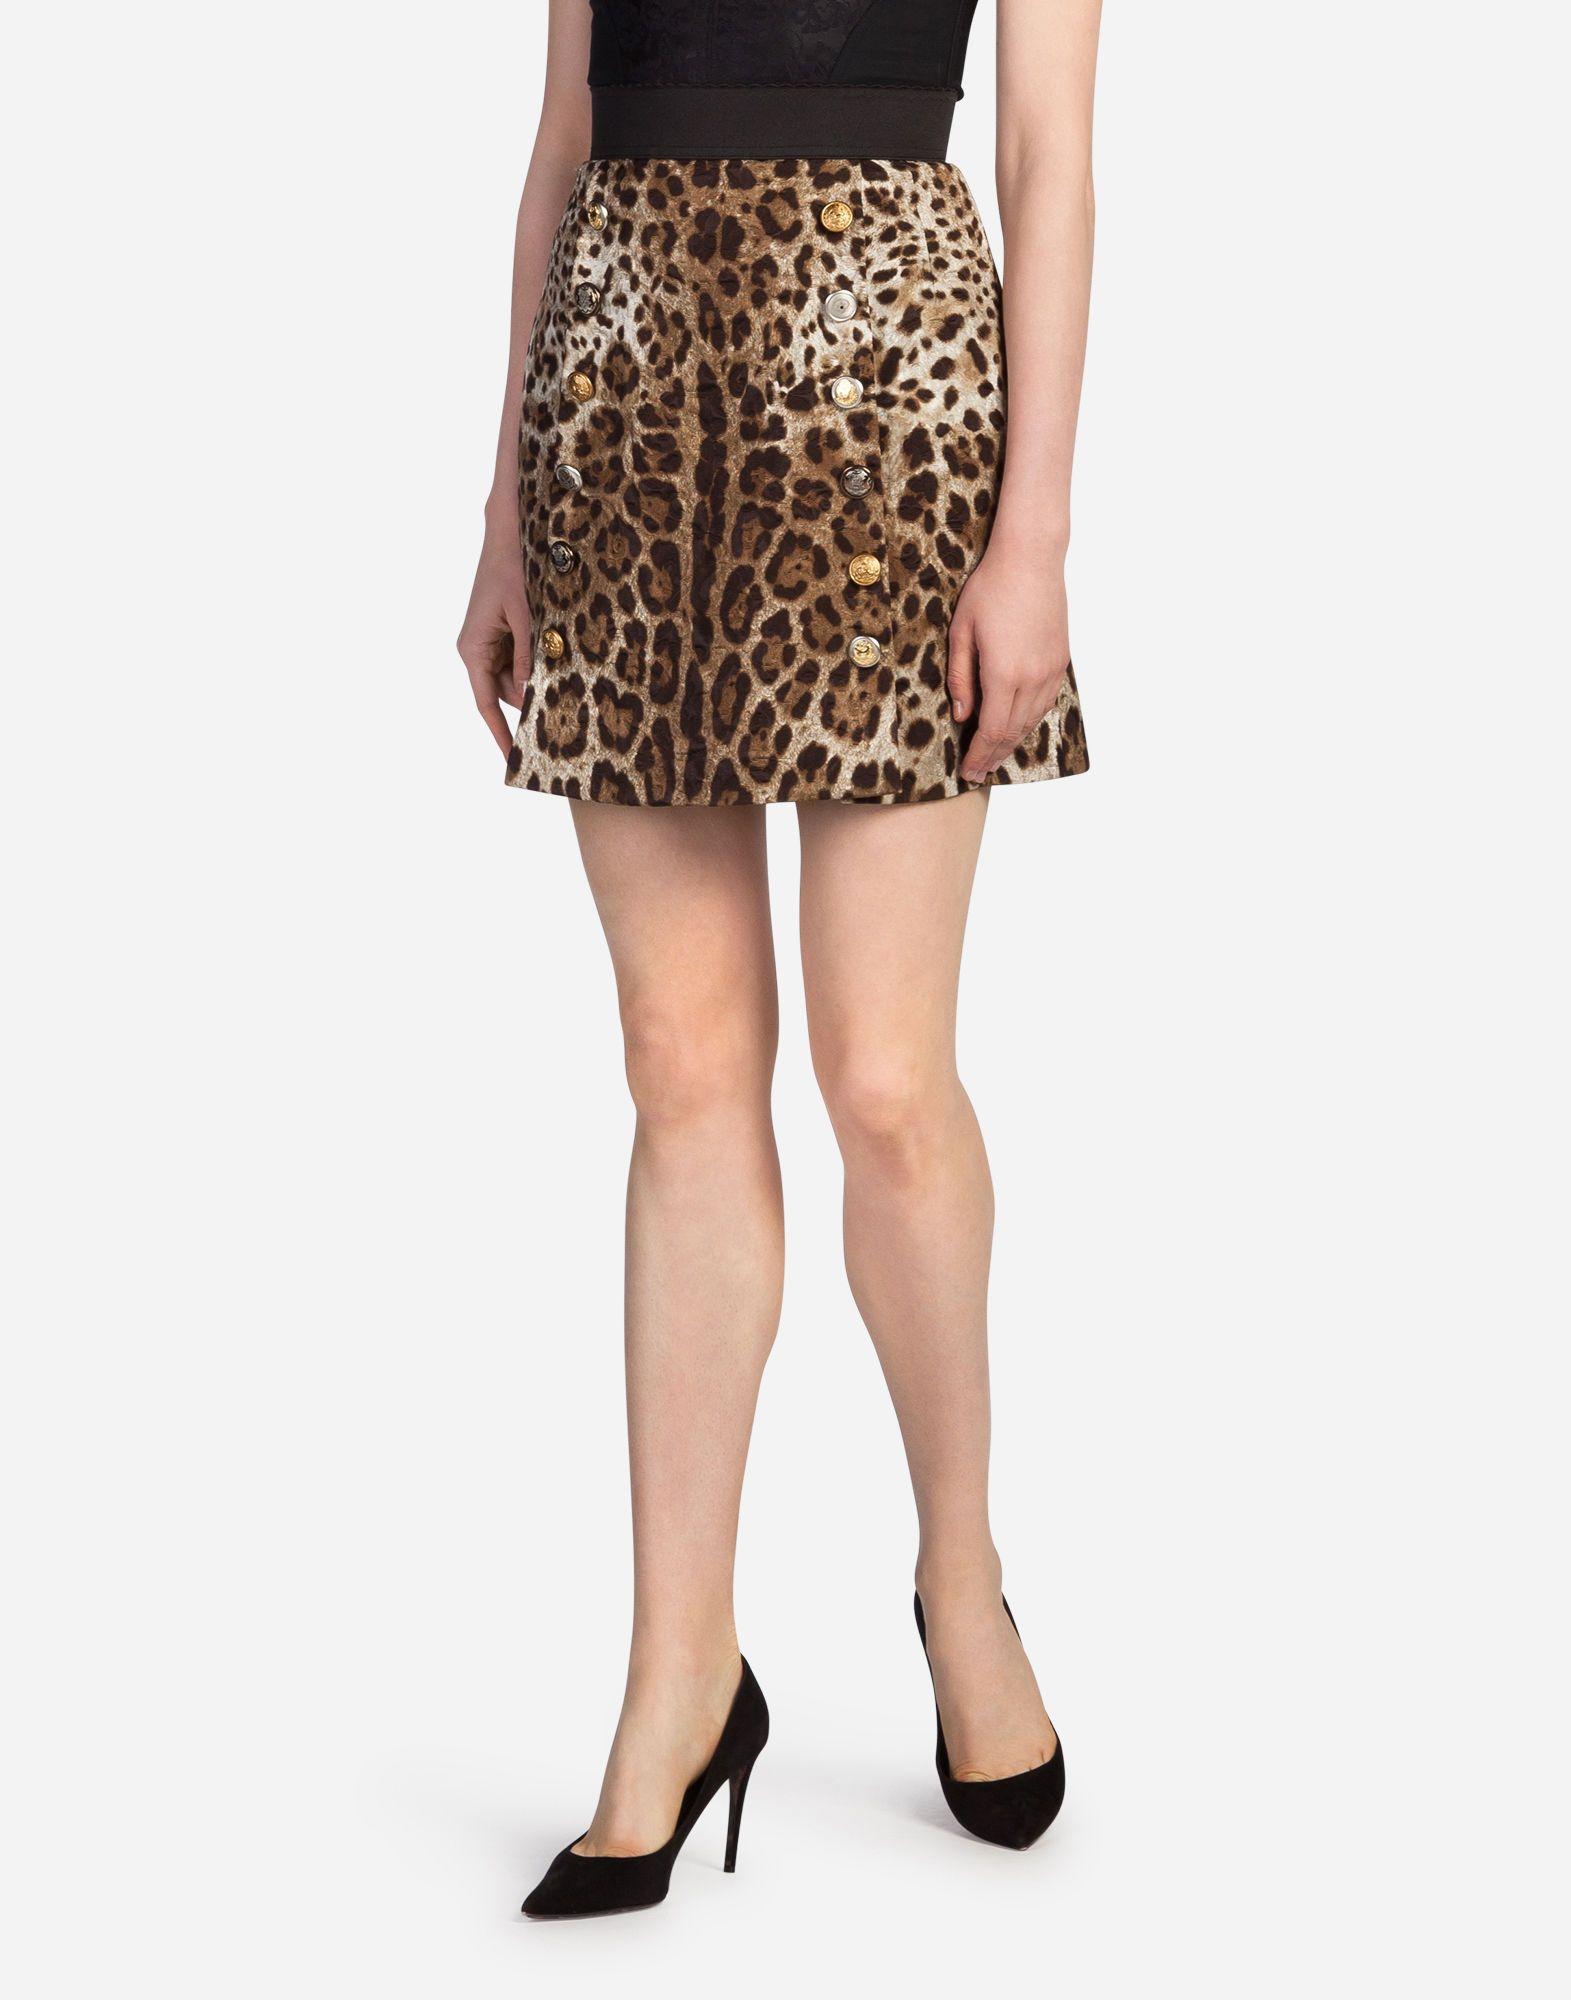 0f111e8dc9e1 DOLCE & GABBANA Leopard Print Brocade Skirt. #dolcegabbana #bags #rayon  #polyester #cotton #